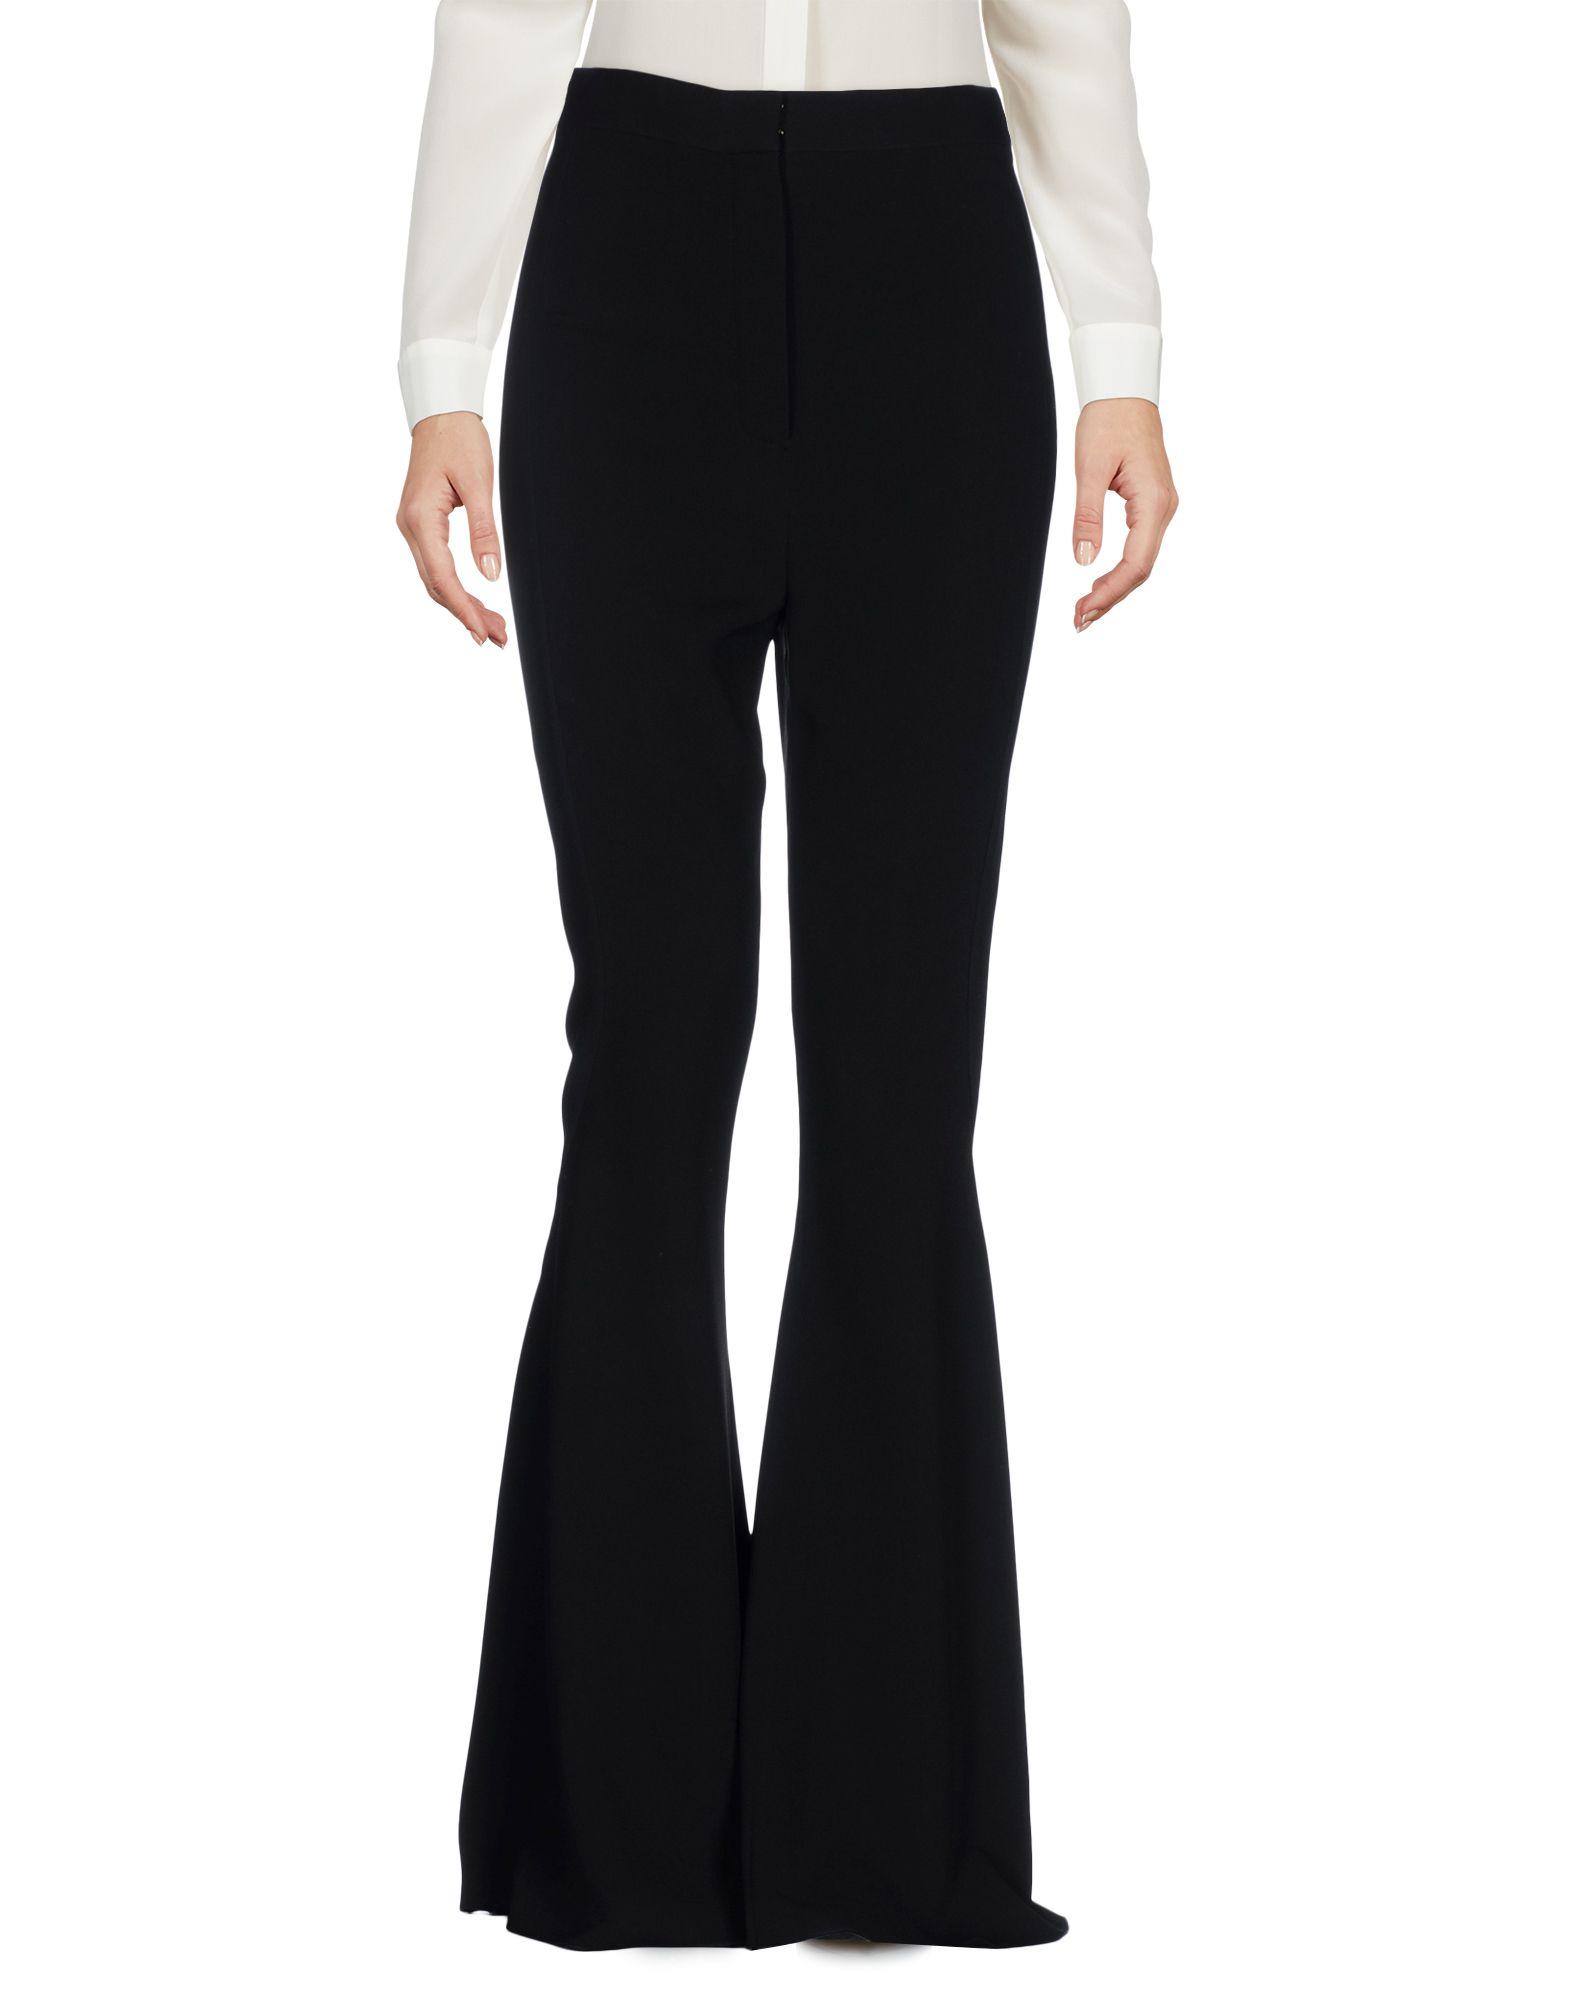 Pantalone Versace Donna - Acquista online su GcSZo7k4Td